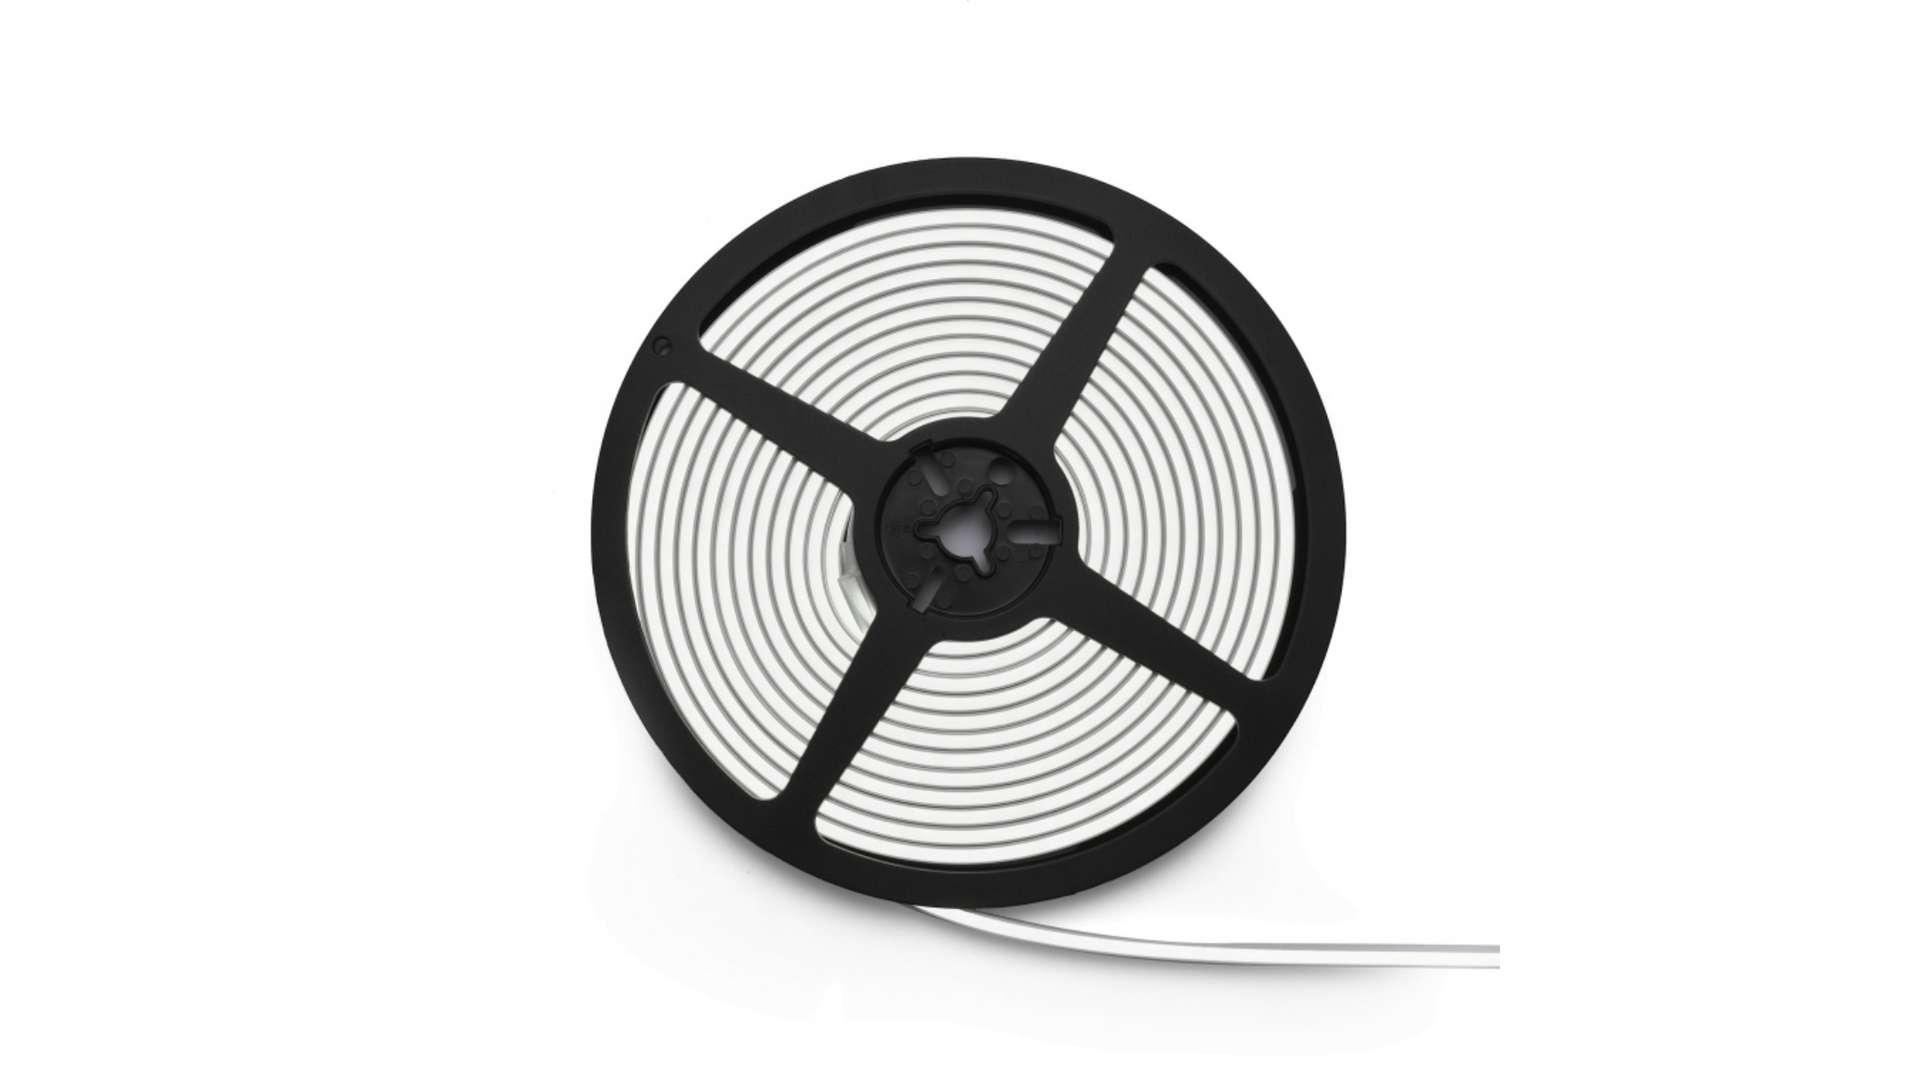 LED Neon Flex 3Y 4x10 140 LED/m 12W/m 24V Neutral white